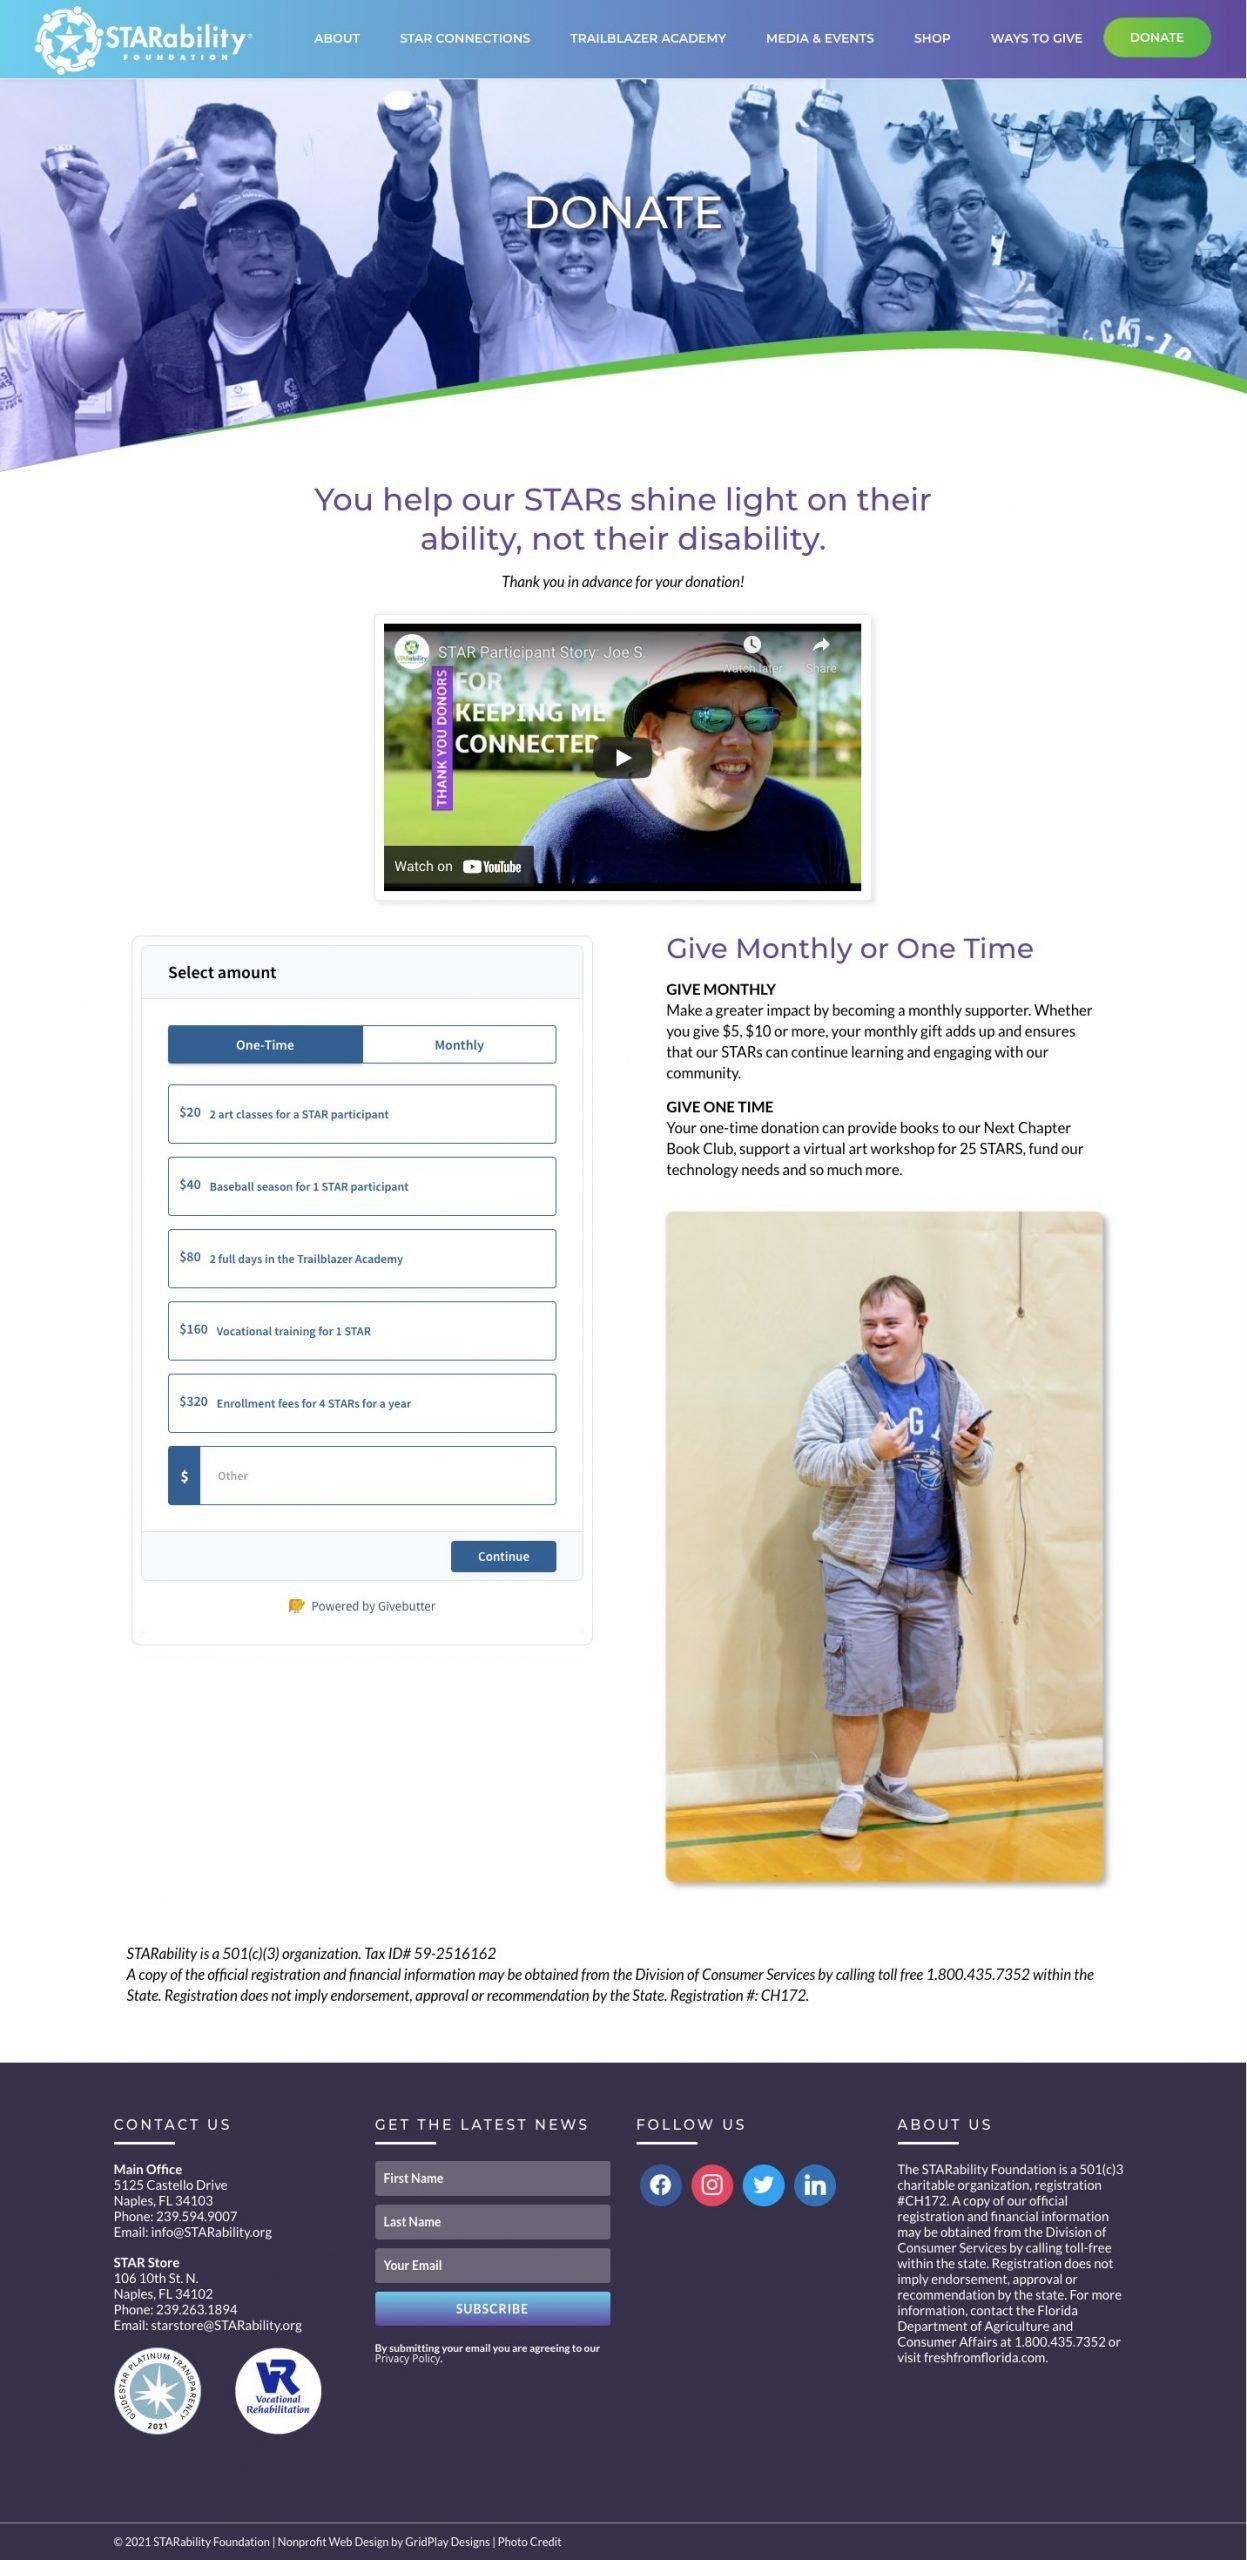 STARability Foundation Donate Page